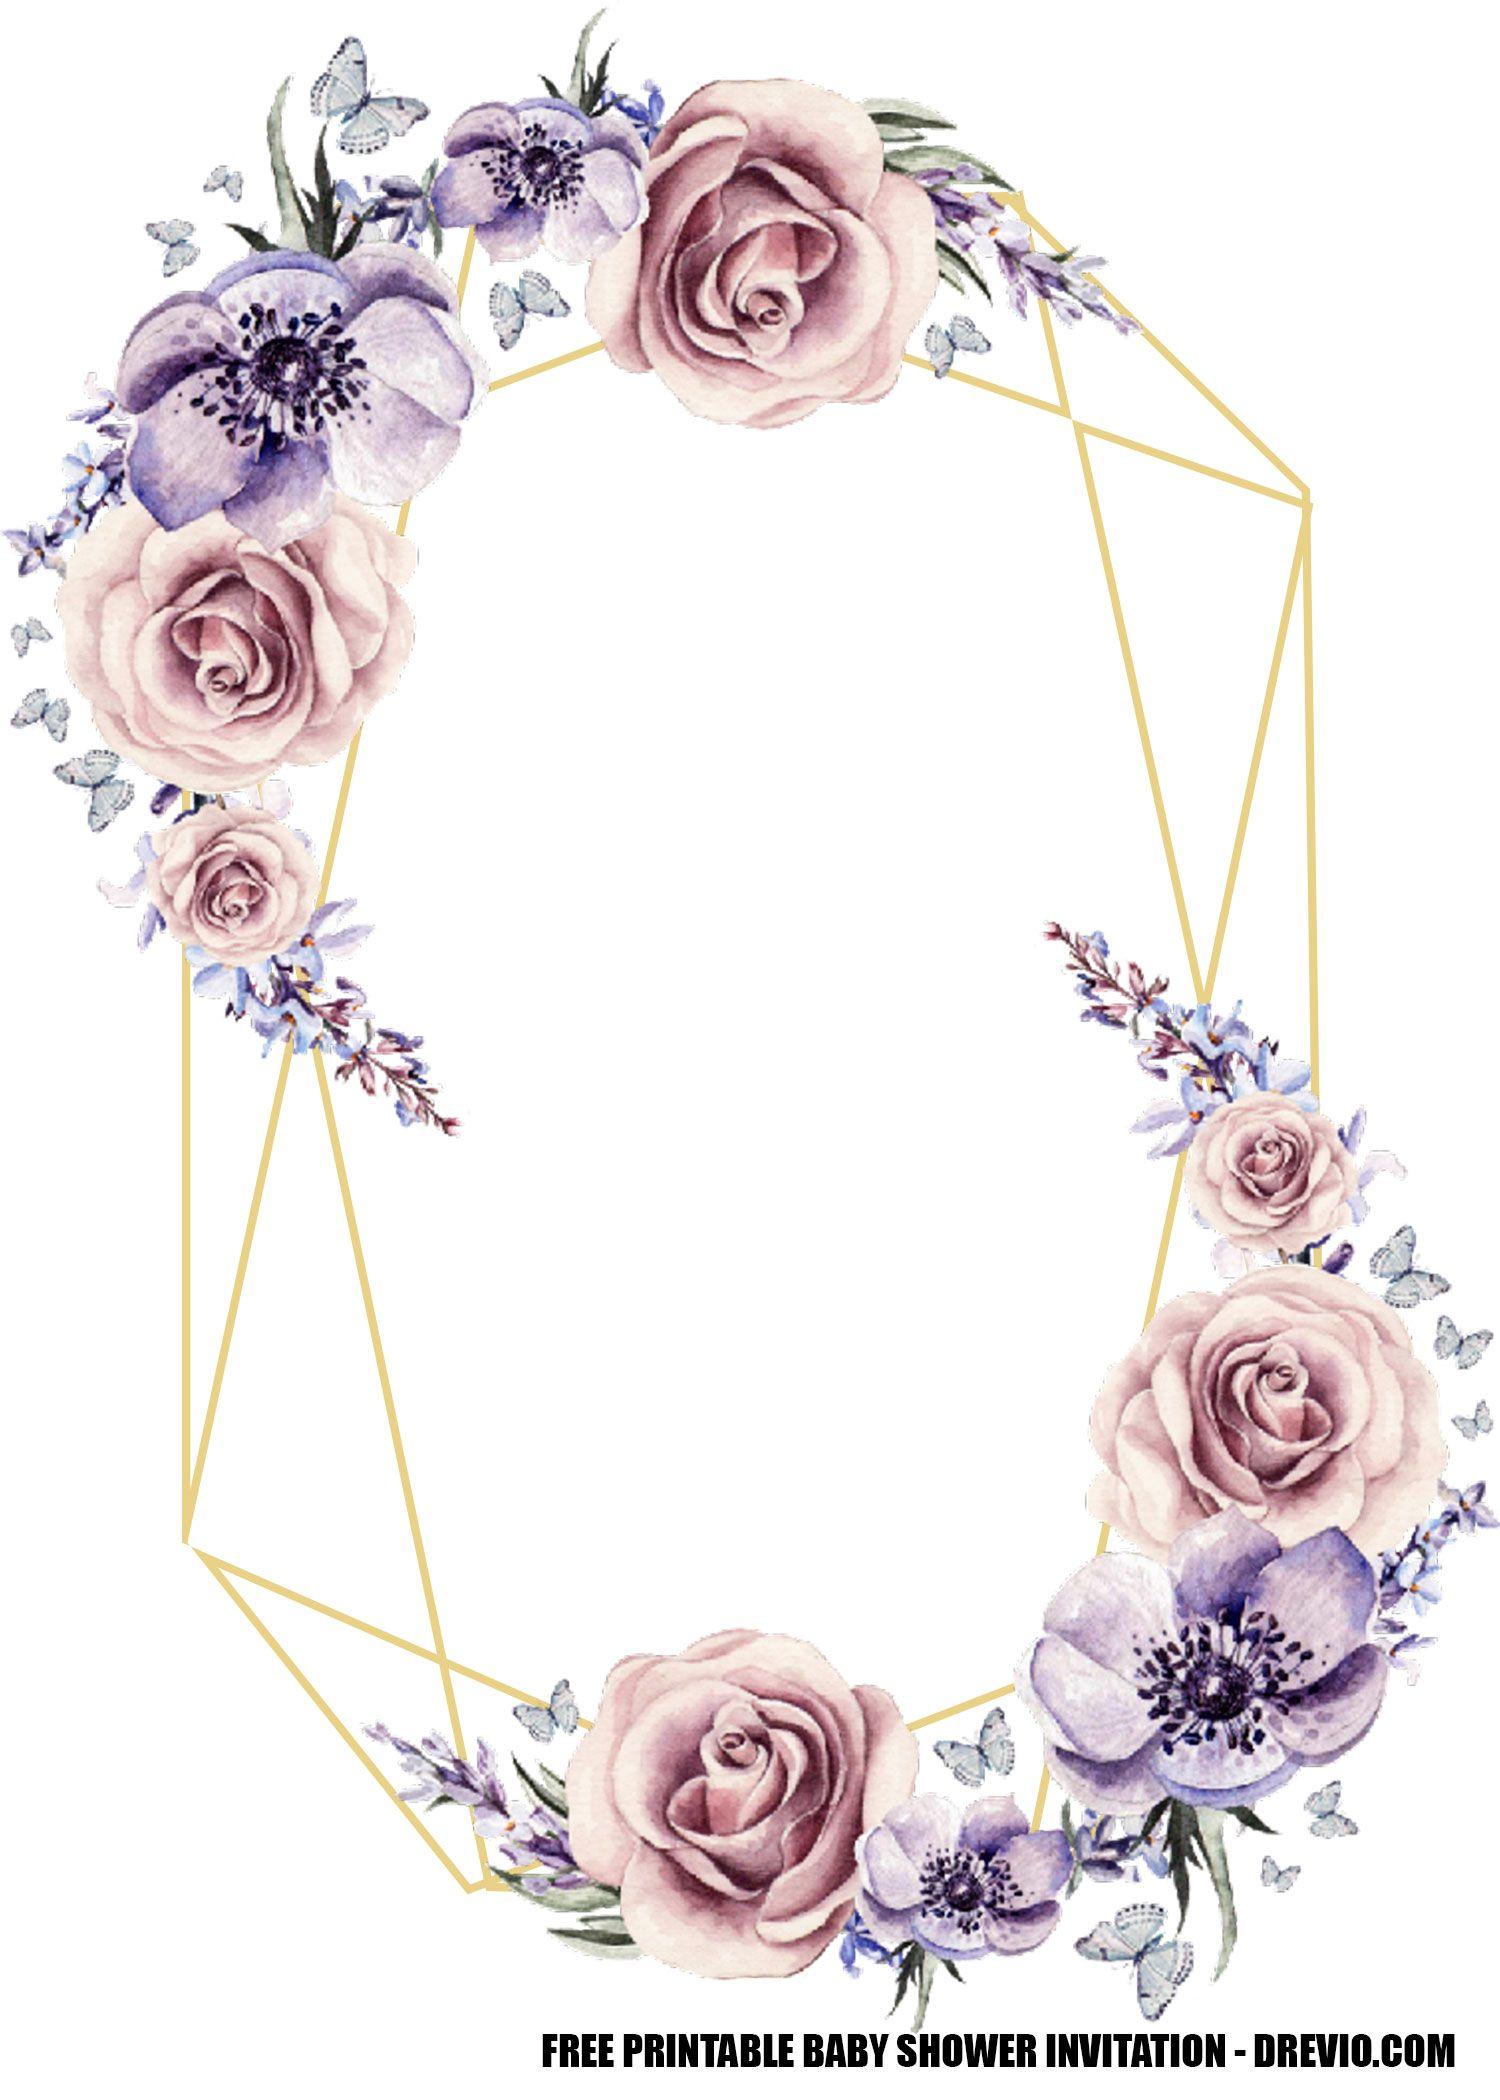 FREE Lavender Rose Wedding Invitation Templates  DREVIO  Free